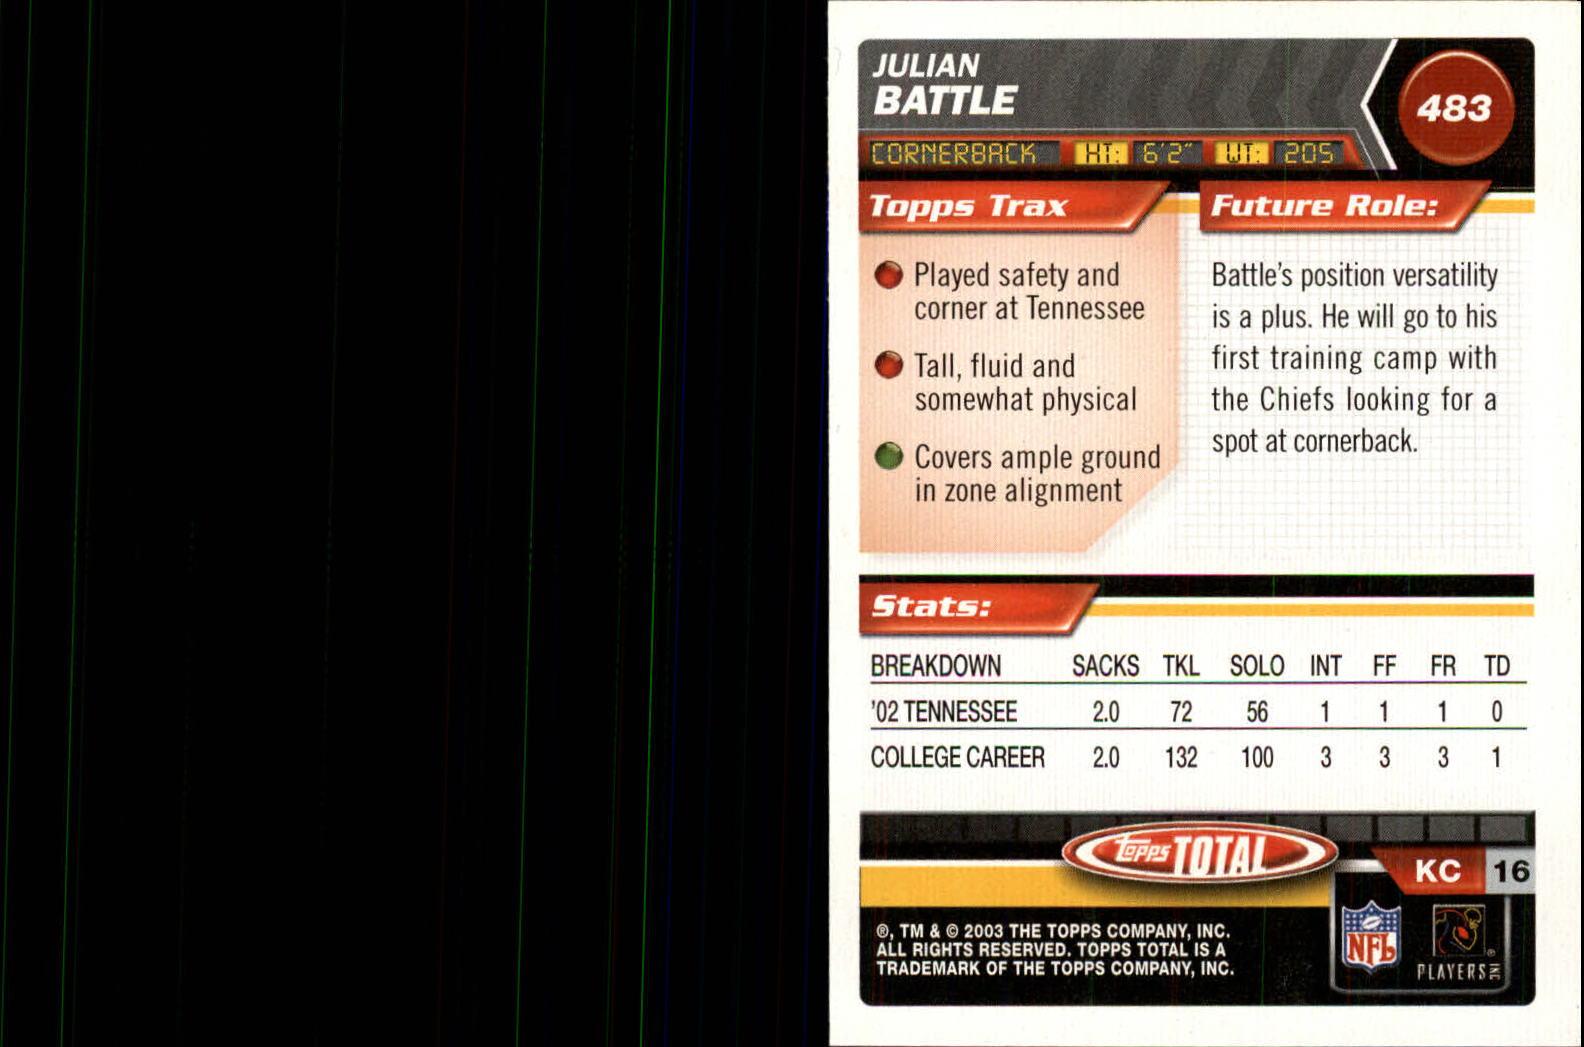 2003 Topps Total Silver #483 Julian Battle back image